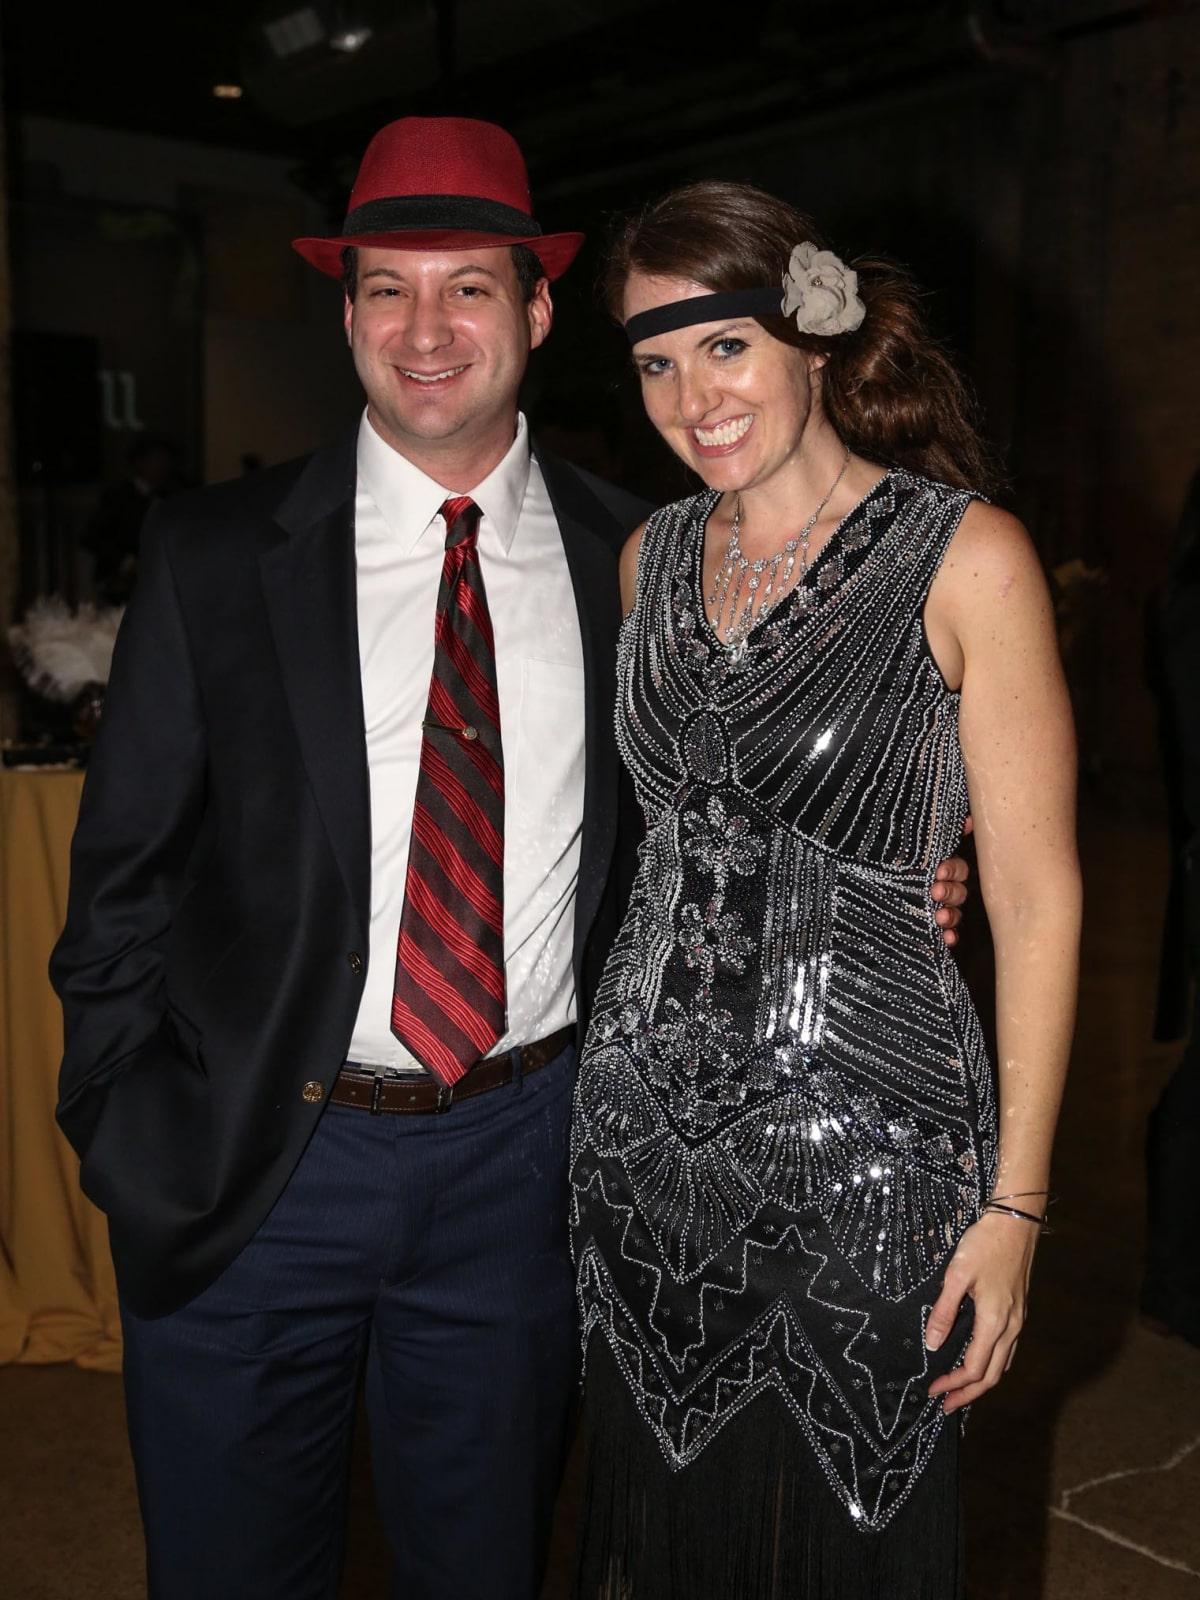 CultureMap Old Forester Bourbon Ball 2016 Shayne Calhoun Rebekah Manley